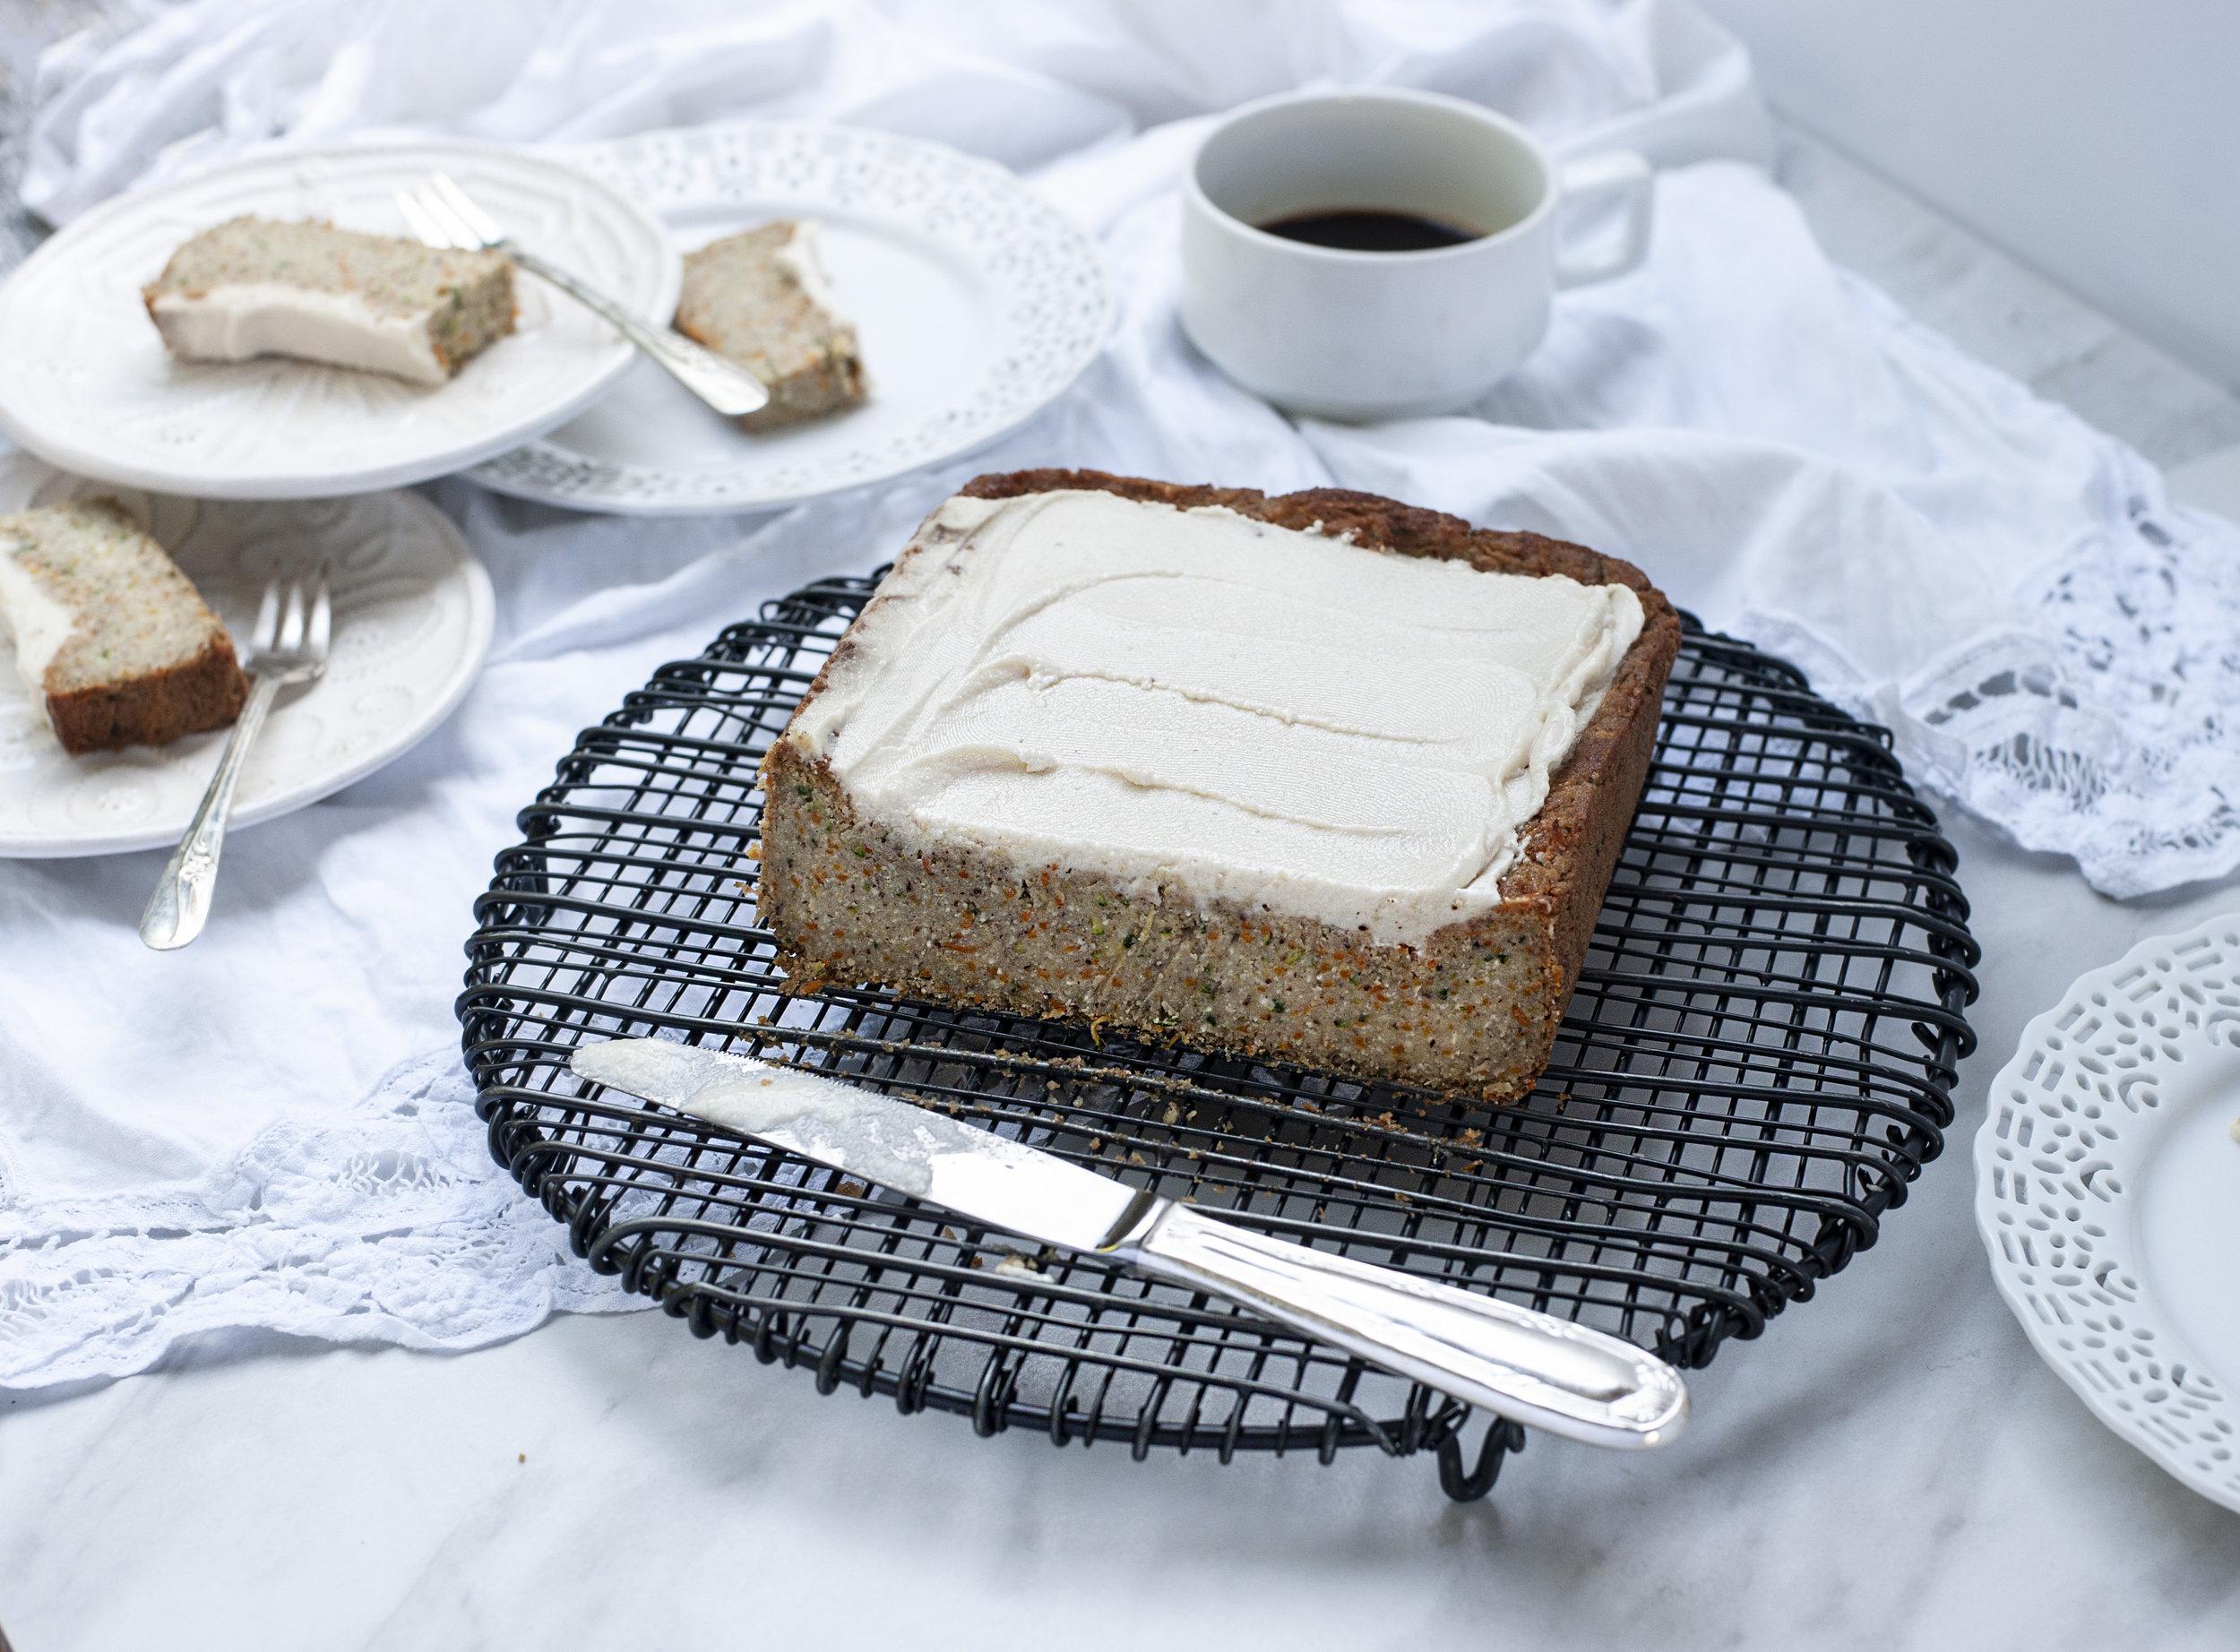 ZucchiniCarrotBread-Slices-Plates.jpg